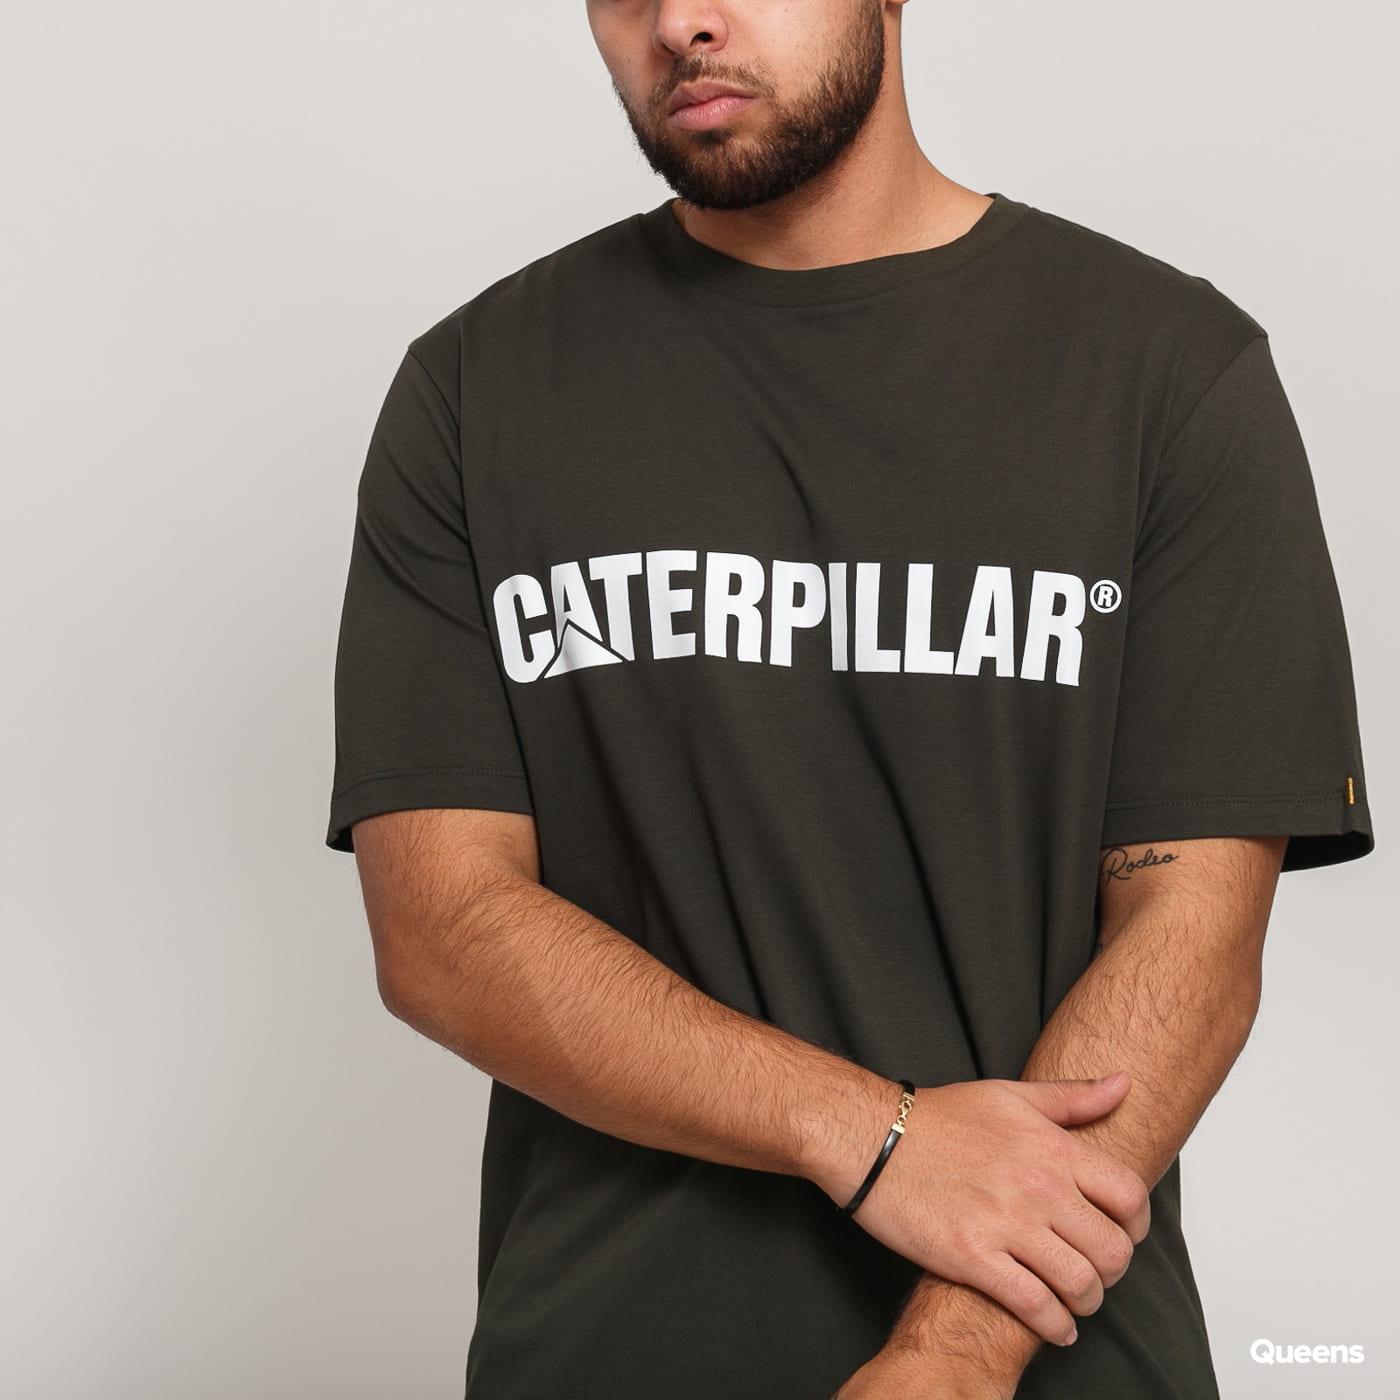 CATERPILLAR Classic Tee tmavo olivové